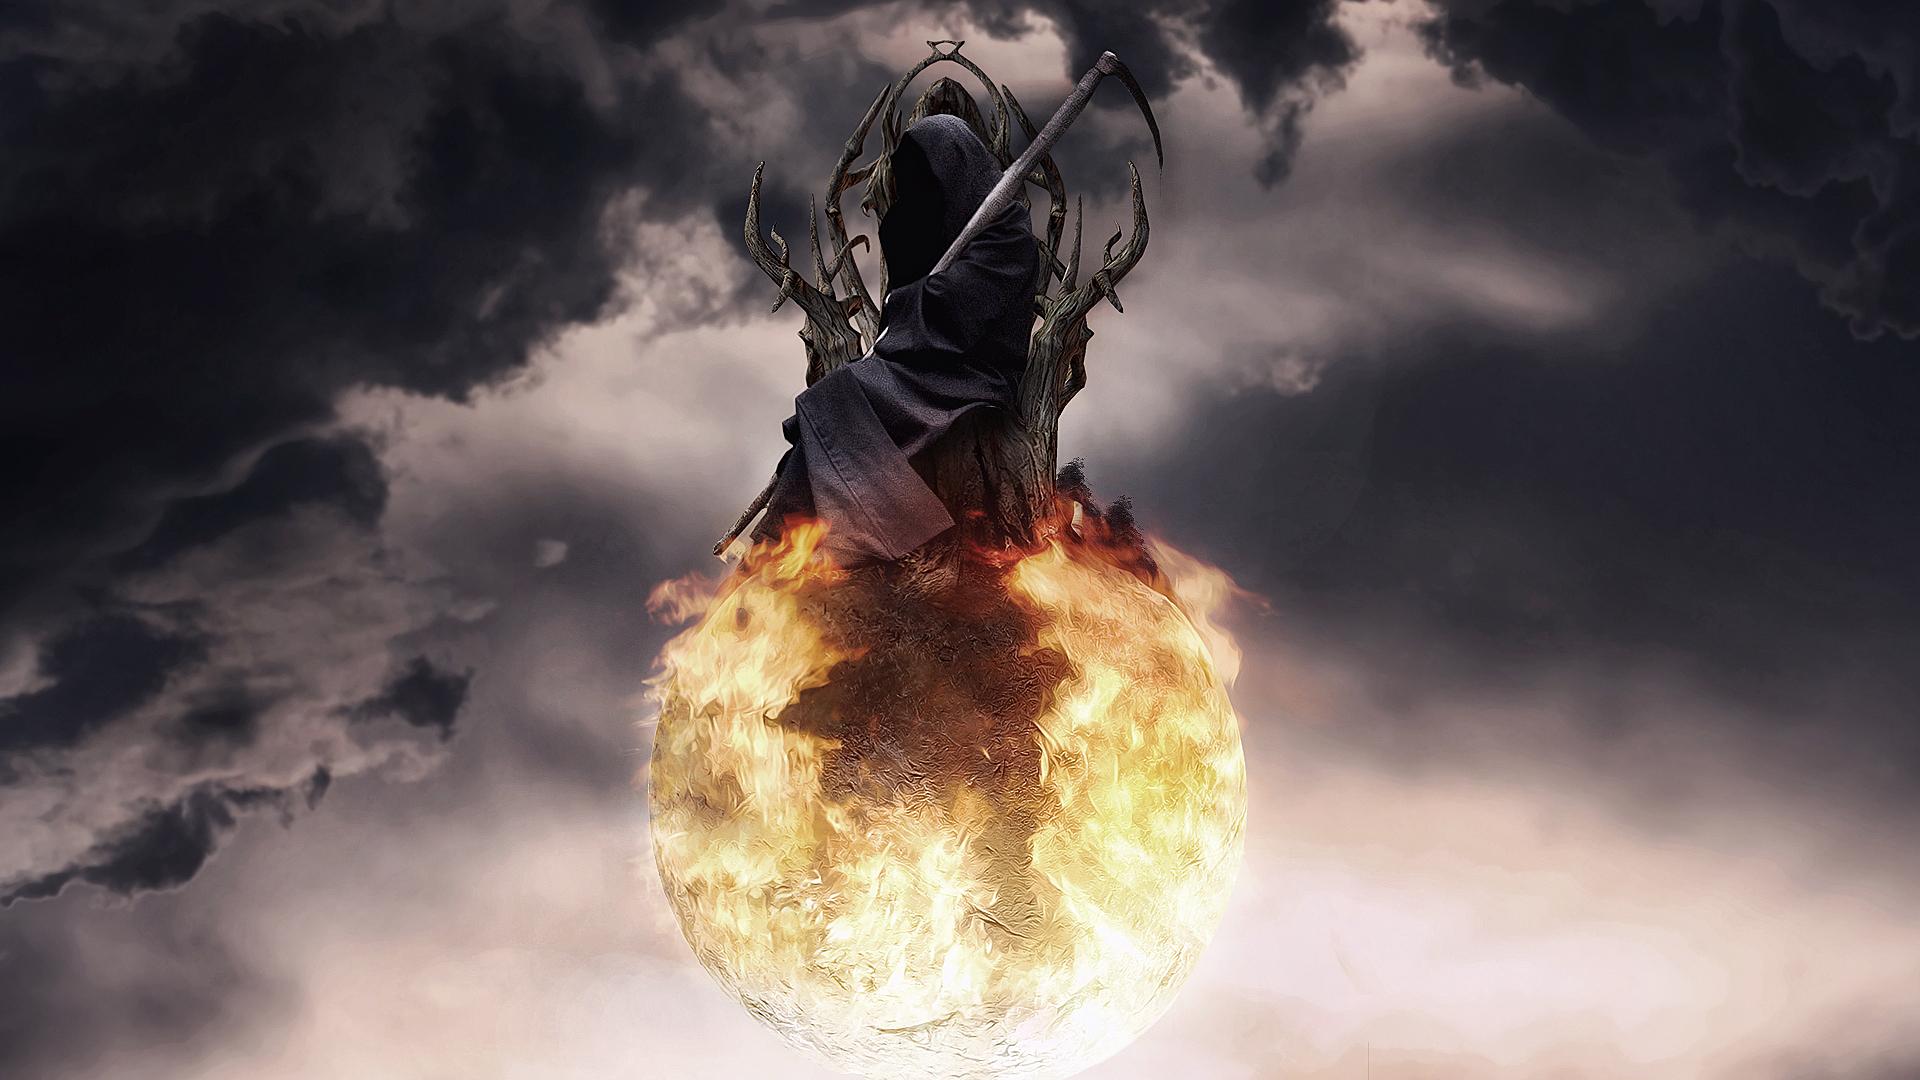 фэнтези графика женщина Grim Reaper  № 3256236 без смс